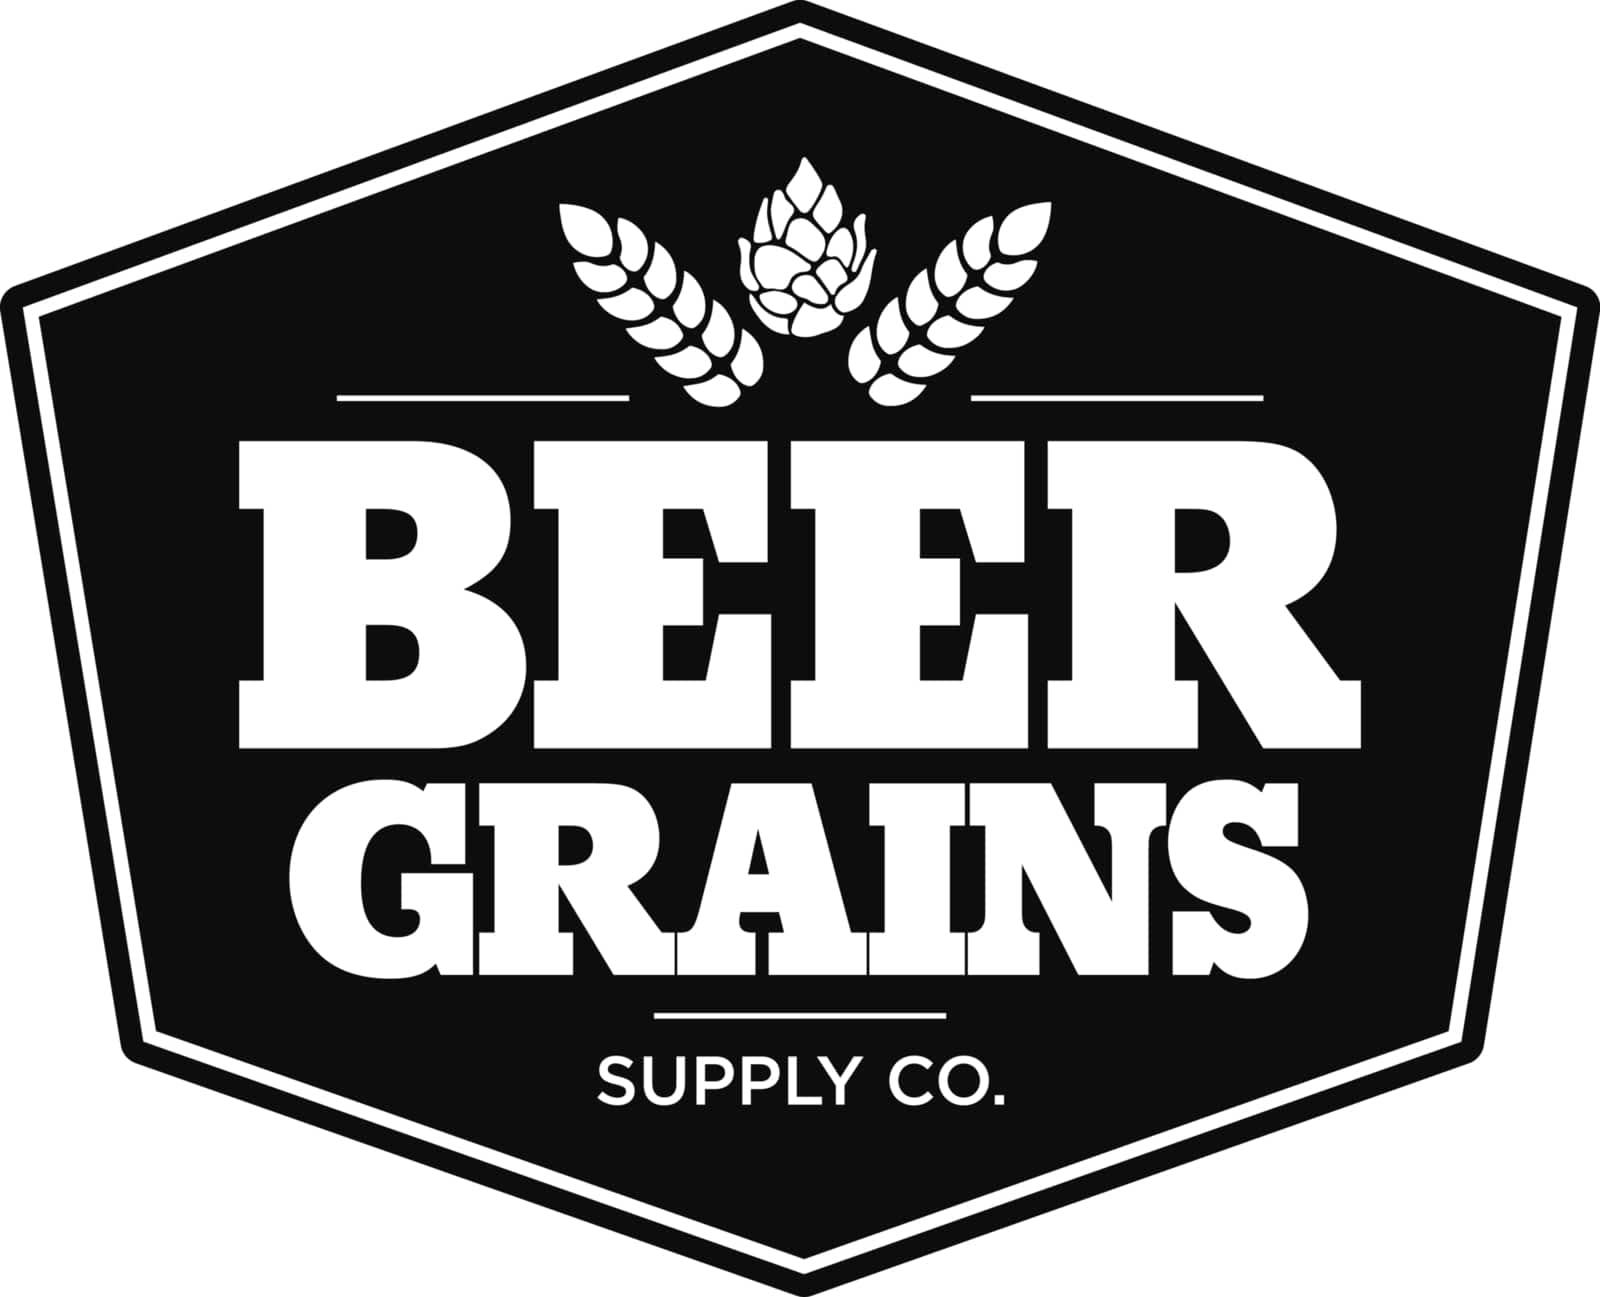 beer-grains-supply-co-la-chope-a-malt-inc-1.jpg